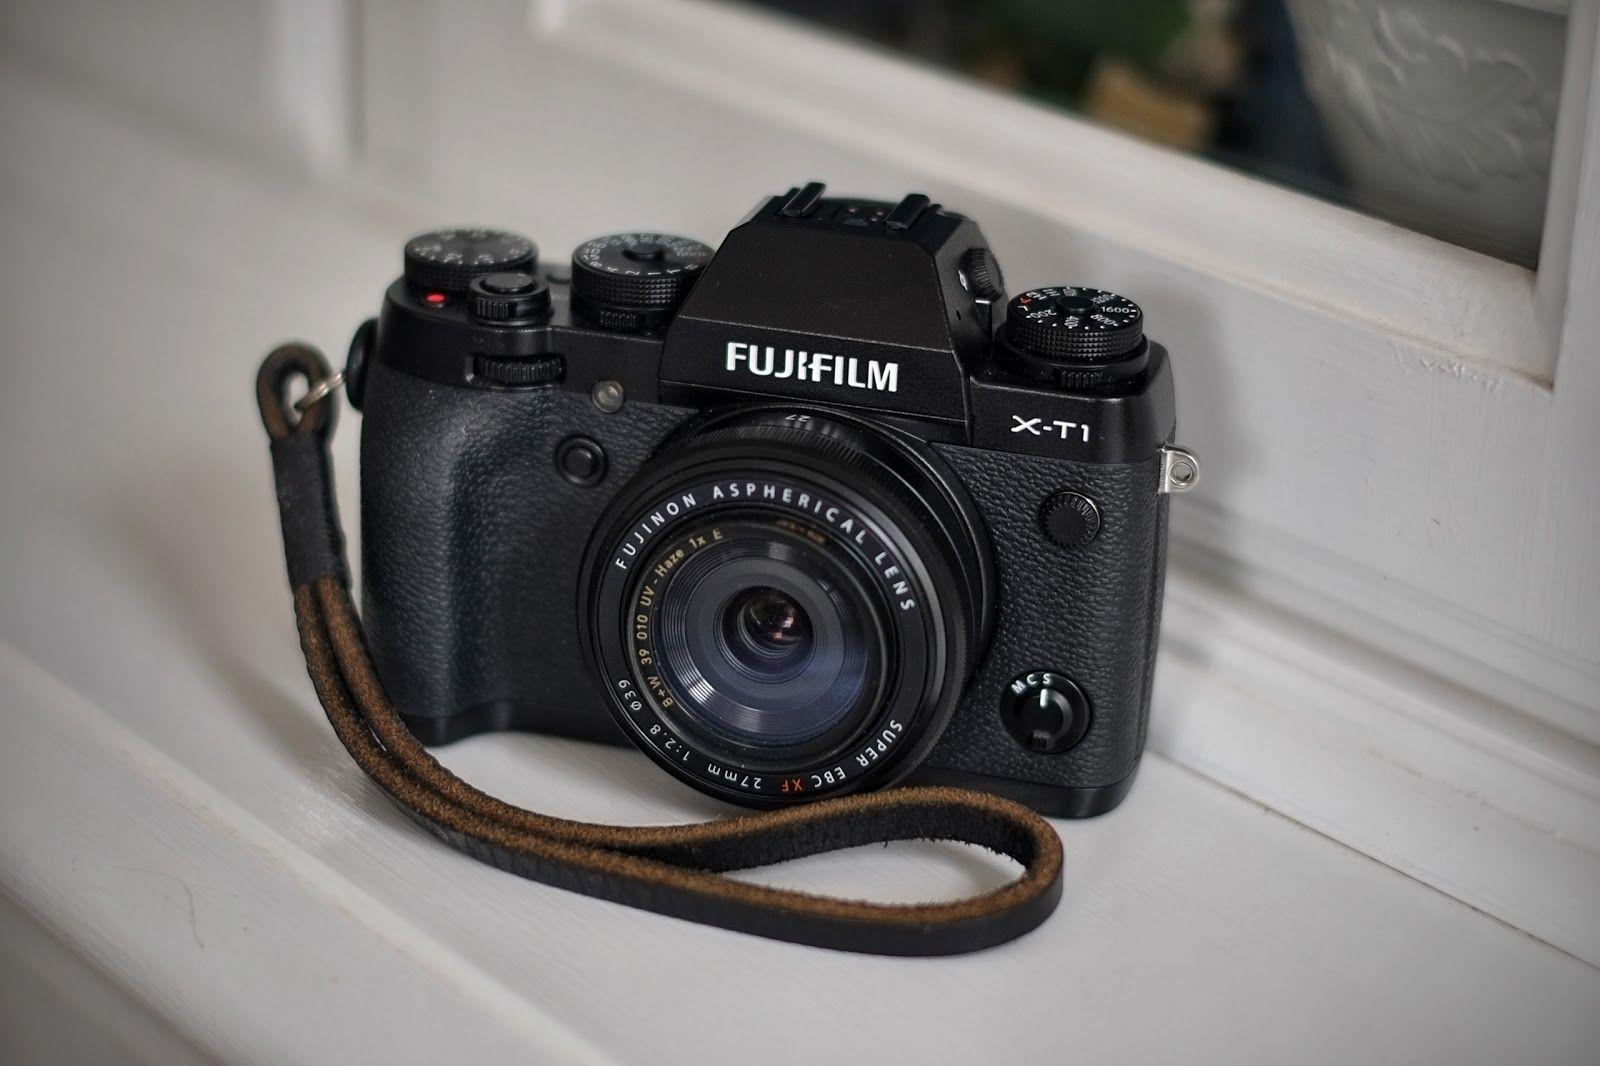 Michael St Jean Photography Fujinon 27mm Uk Holiday Hero Fujifilm X T100 Body Xf35mm F2 Gold Kamera Mirrorless Reflex Camera